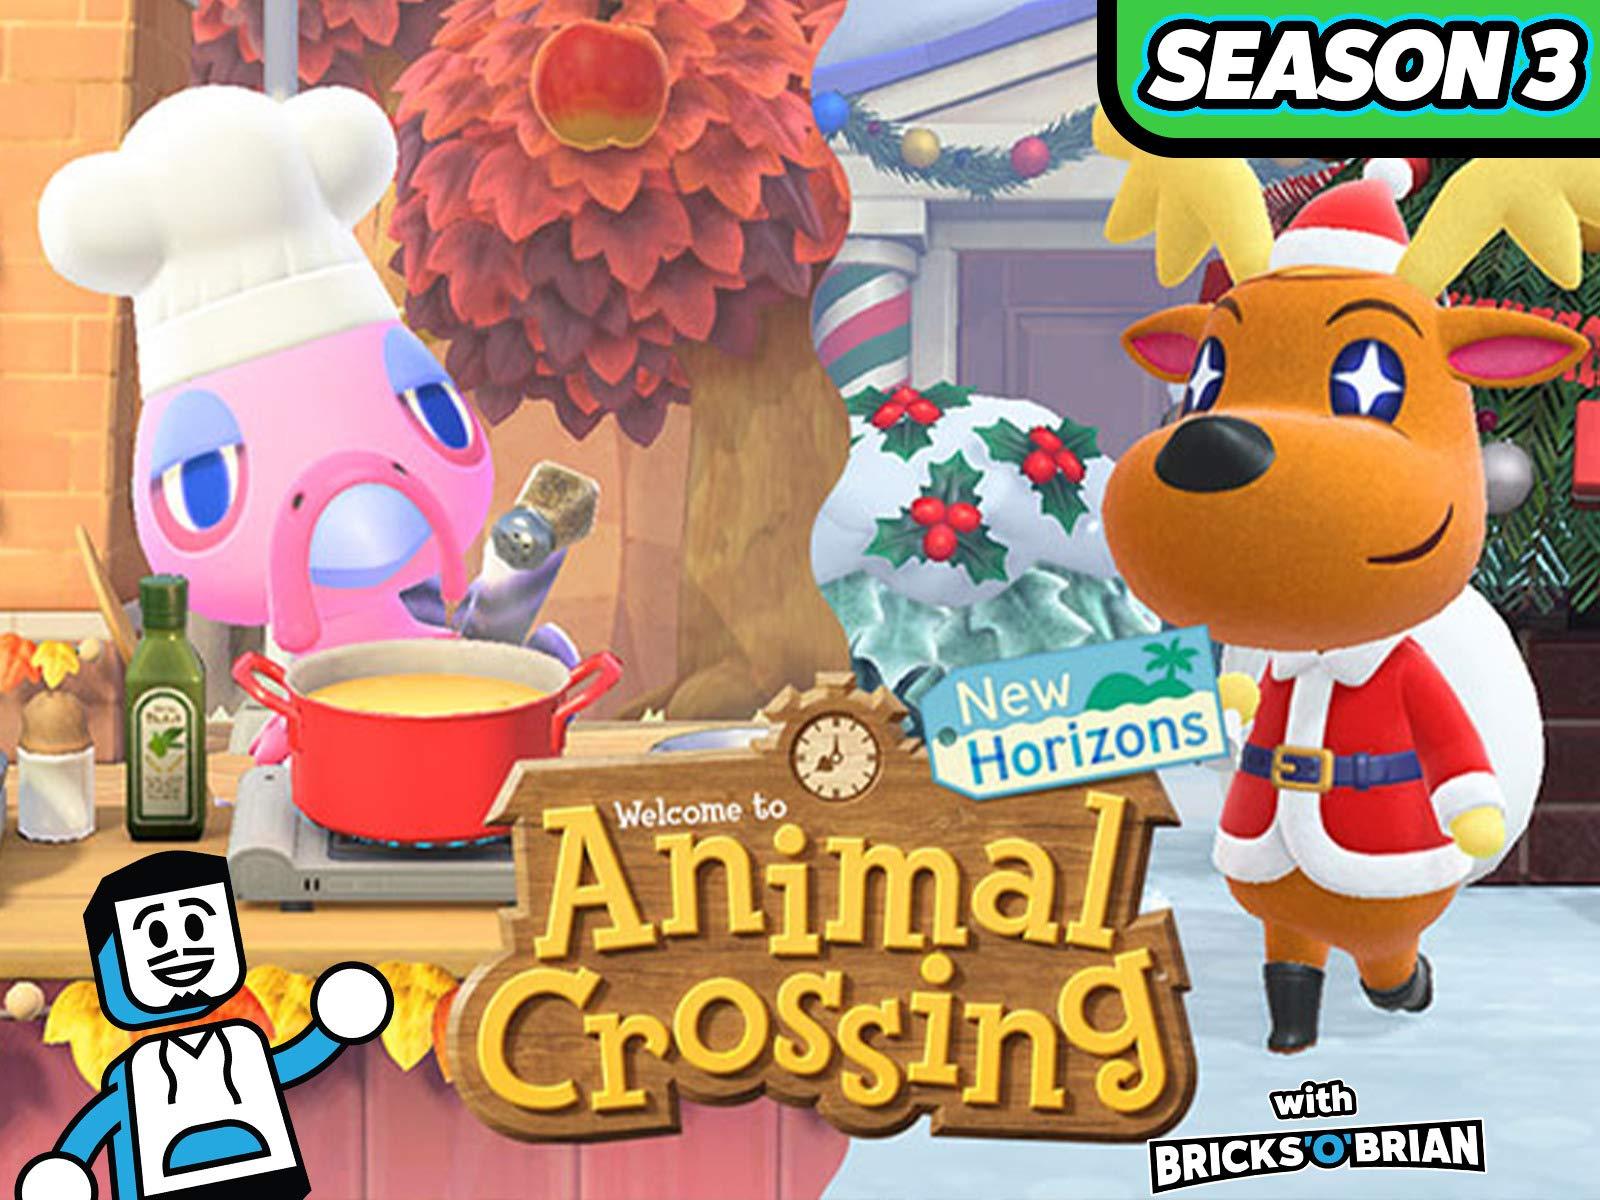 Clip: Animal Crossing New Horizons with Bricks 'O' Brian! - Season 3